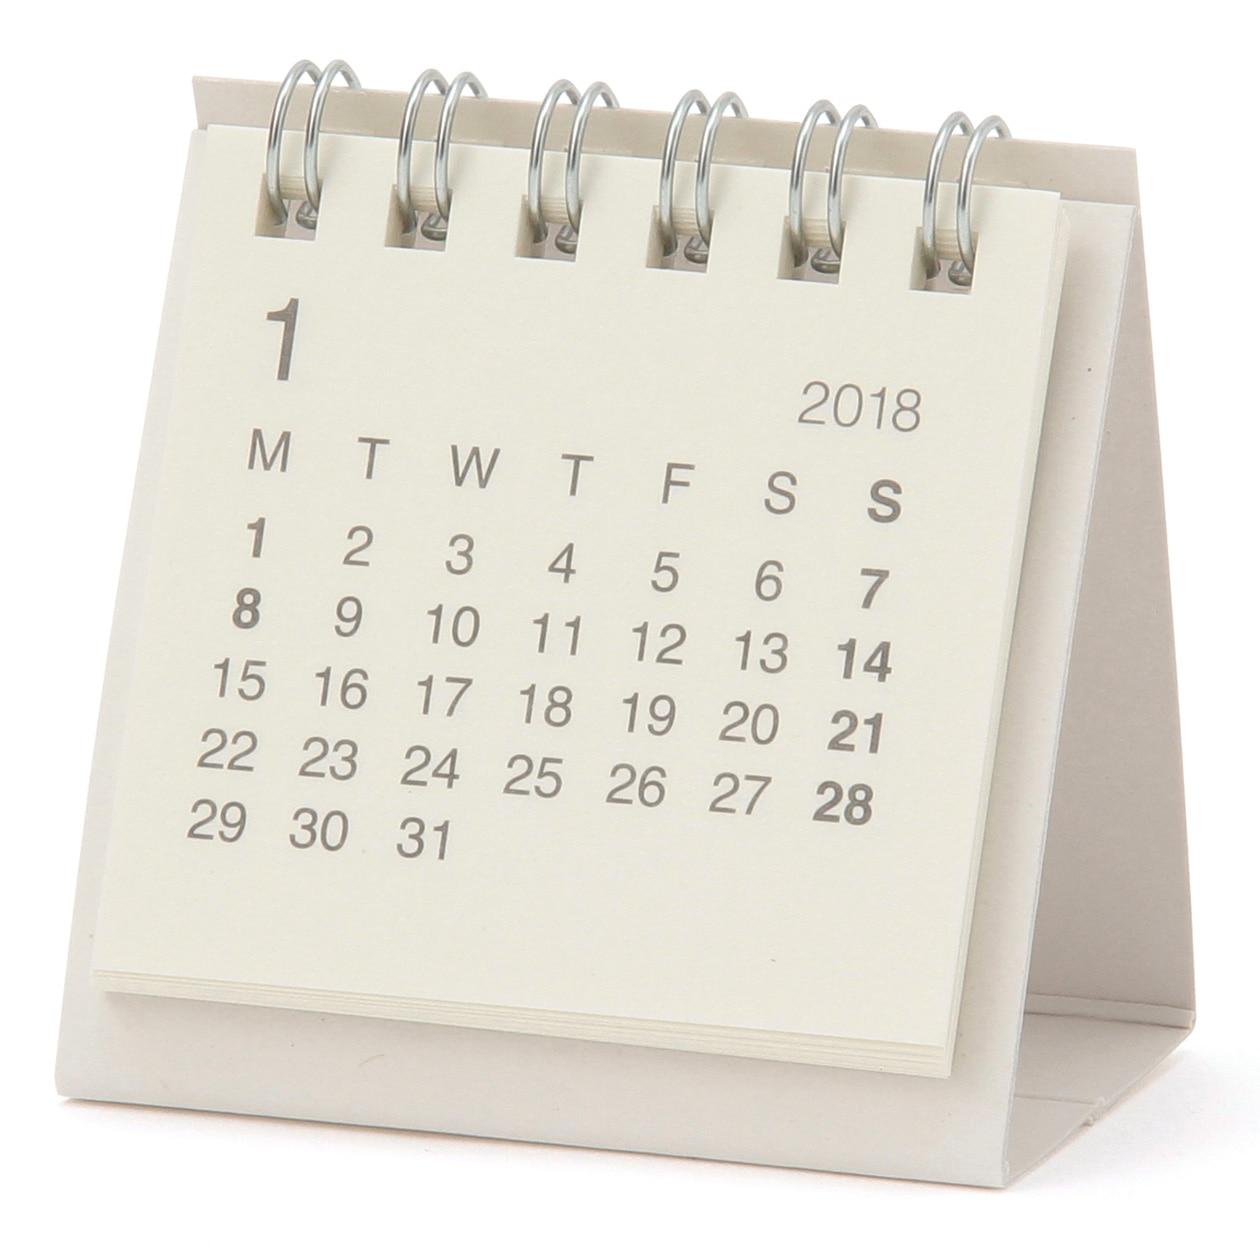 RoomClip商品情報 - バガスペーパーデスクトップミニカレンダー・2018年